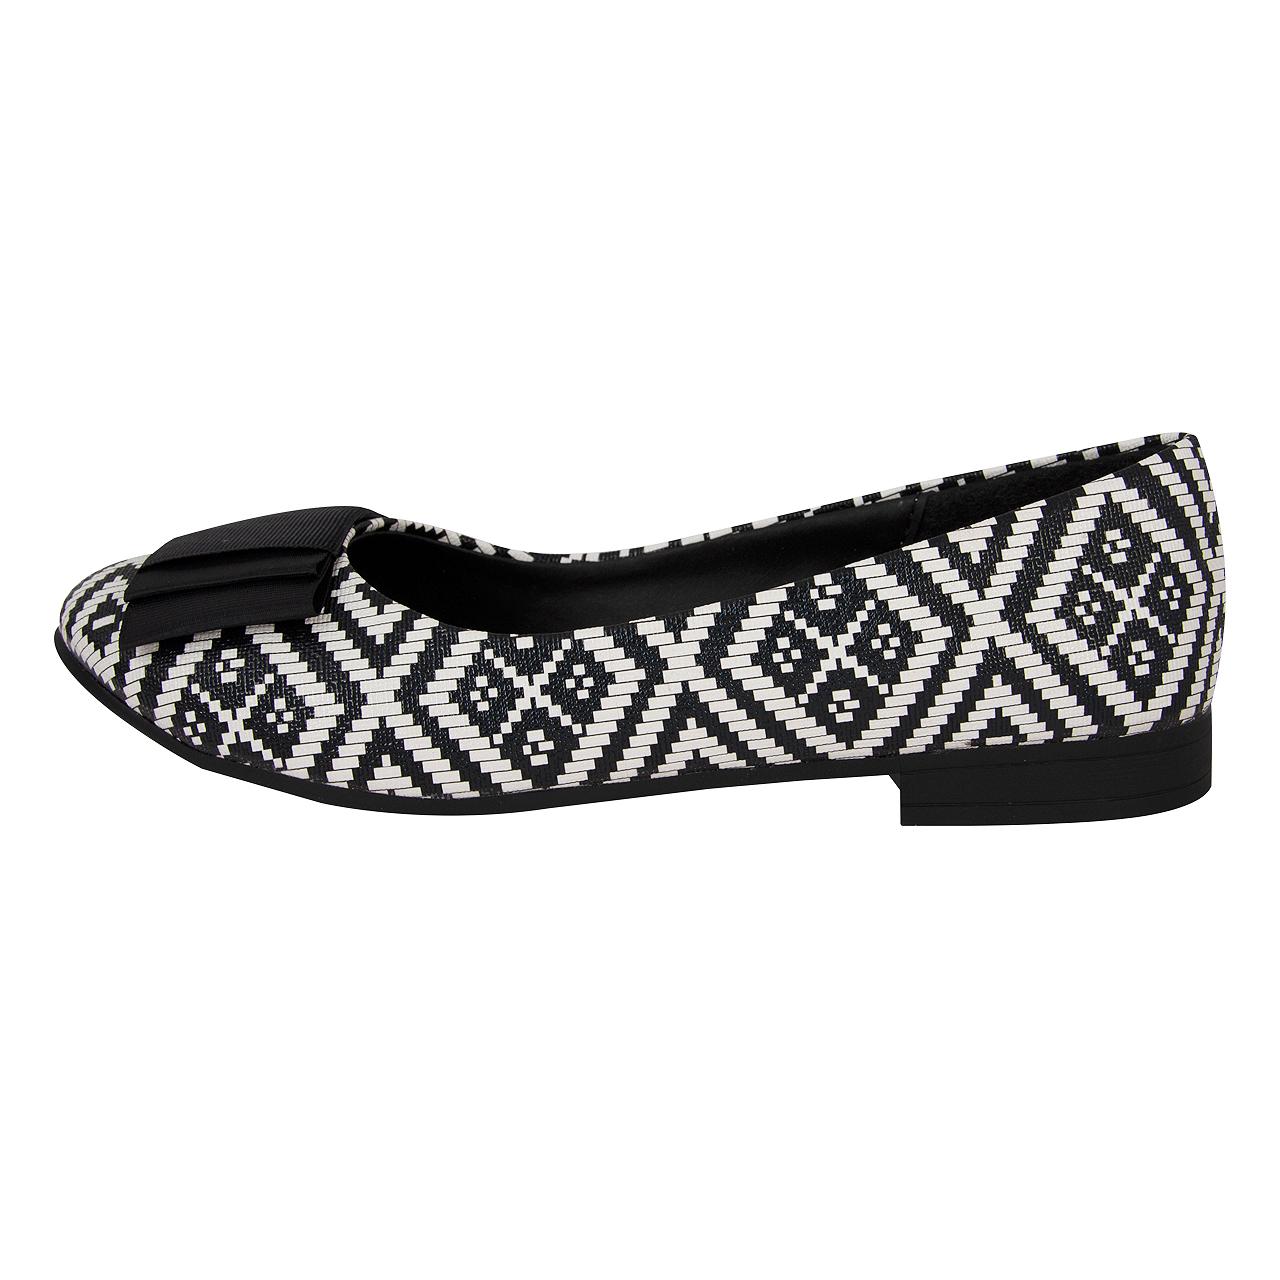 کفش زنانه کد 159011733